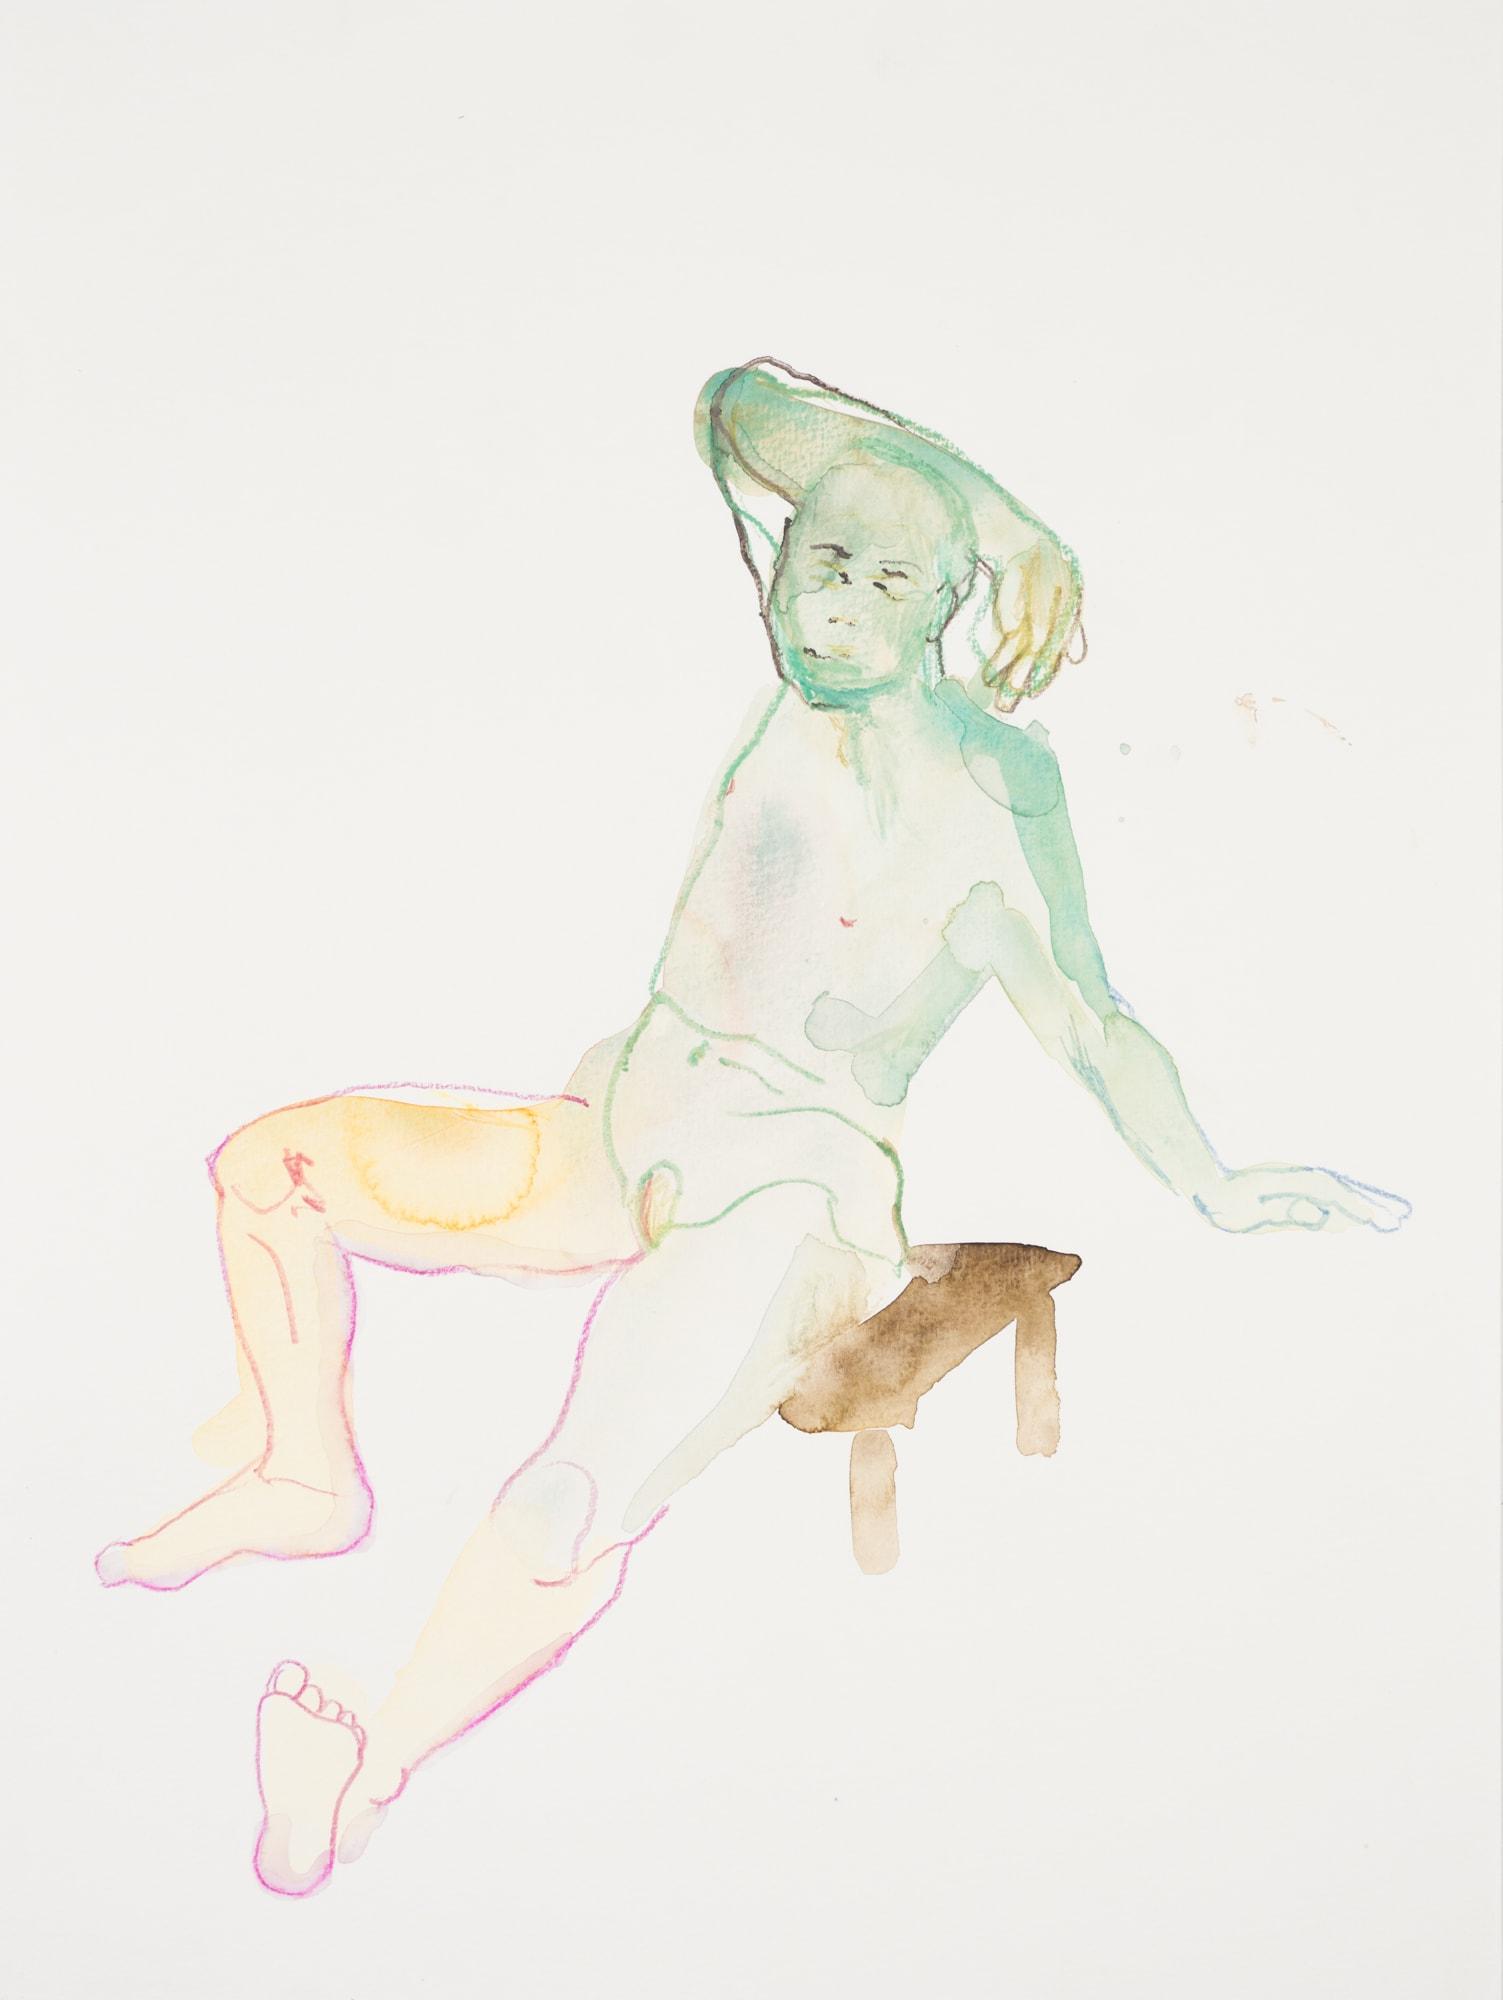 Mischtechnik, Aquarell und Farbstift auf Papier, 30cm x 40cm, Akt, artist: Franziska King